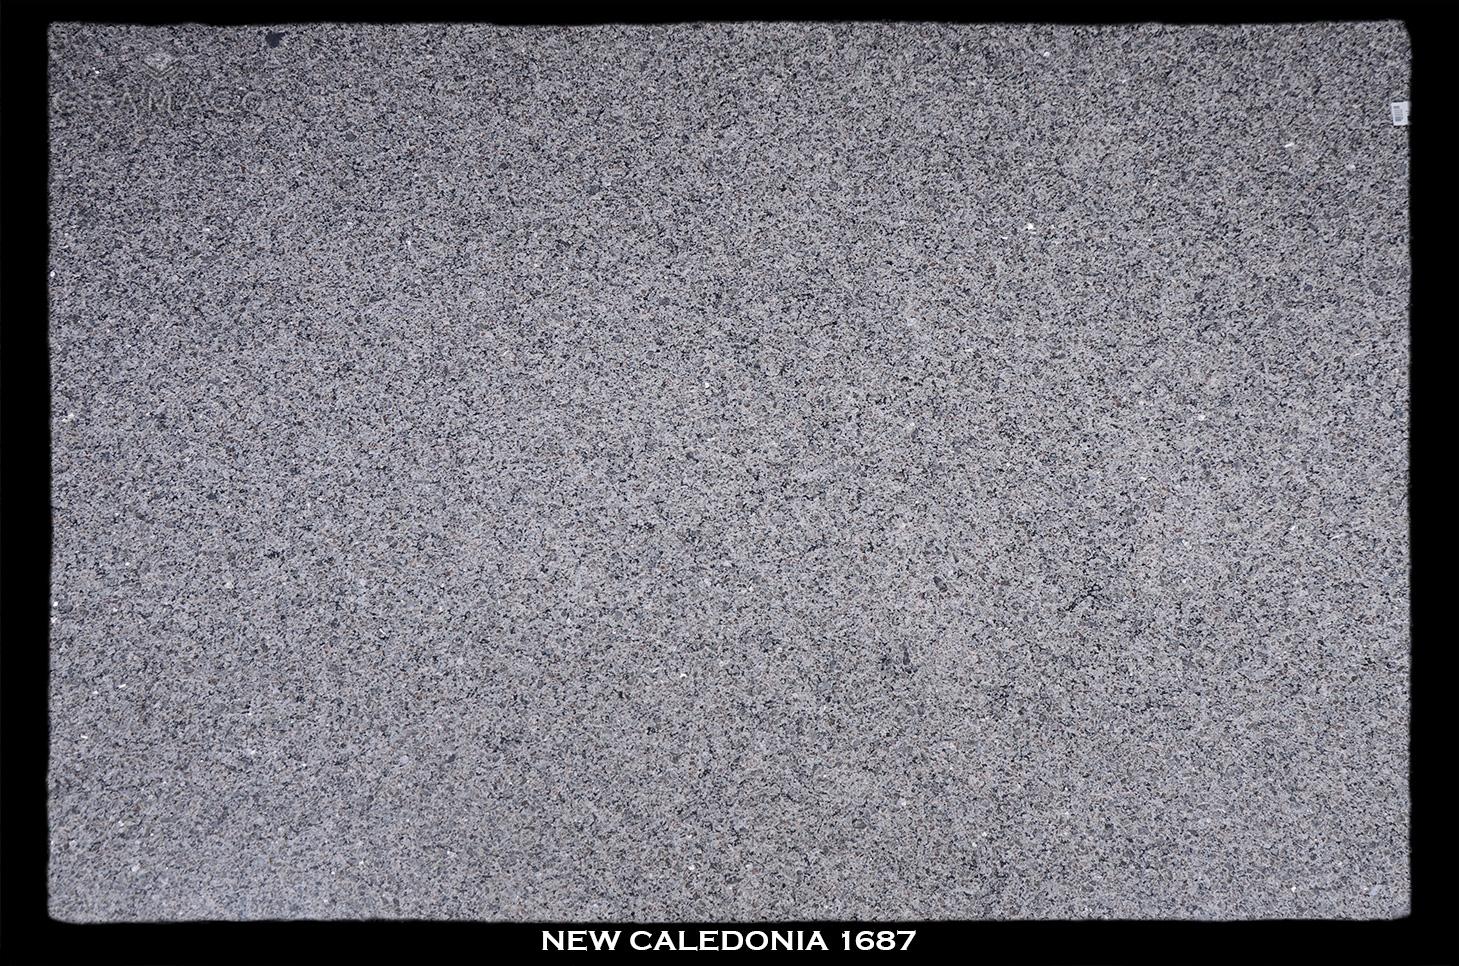 NEW-CALEDONIA-1687